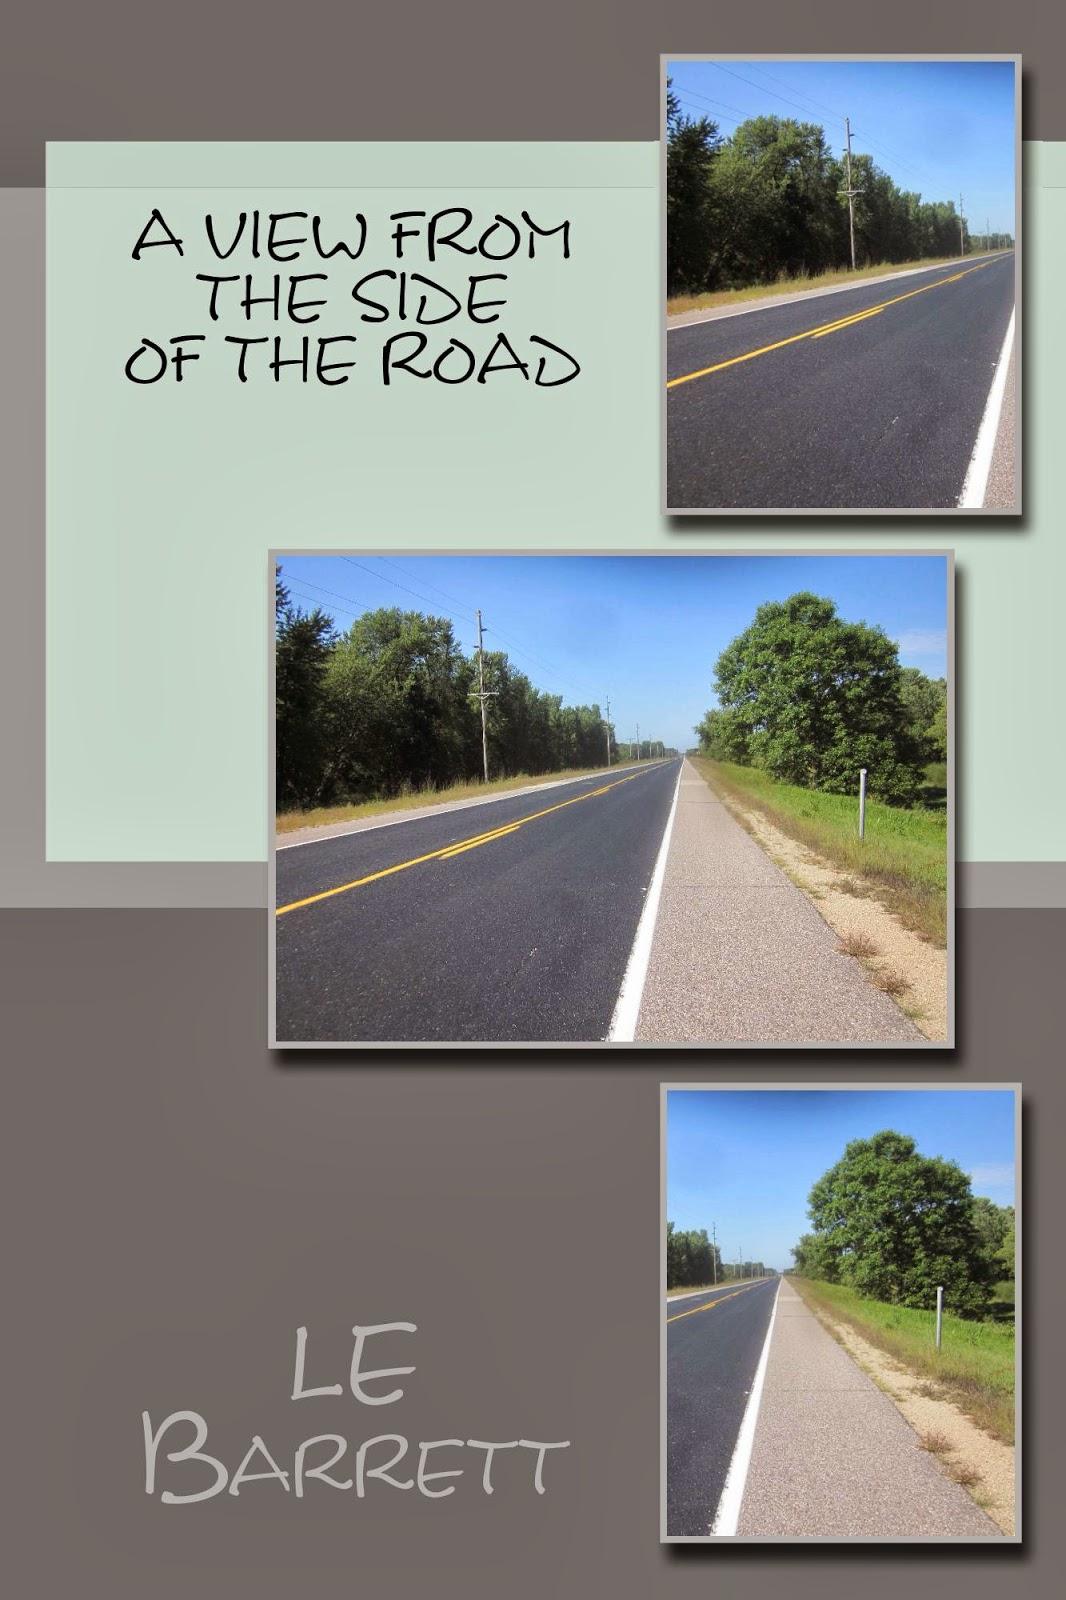 http://www.amazon.com/View-Side-Road-Barrett/dp/1494412918/ref=la_B00H8AZONS_1_2?s=books&ie=UTF8&qid=1395788241&sr=1-2